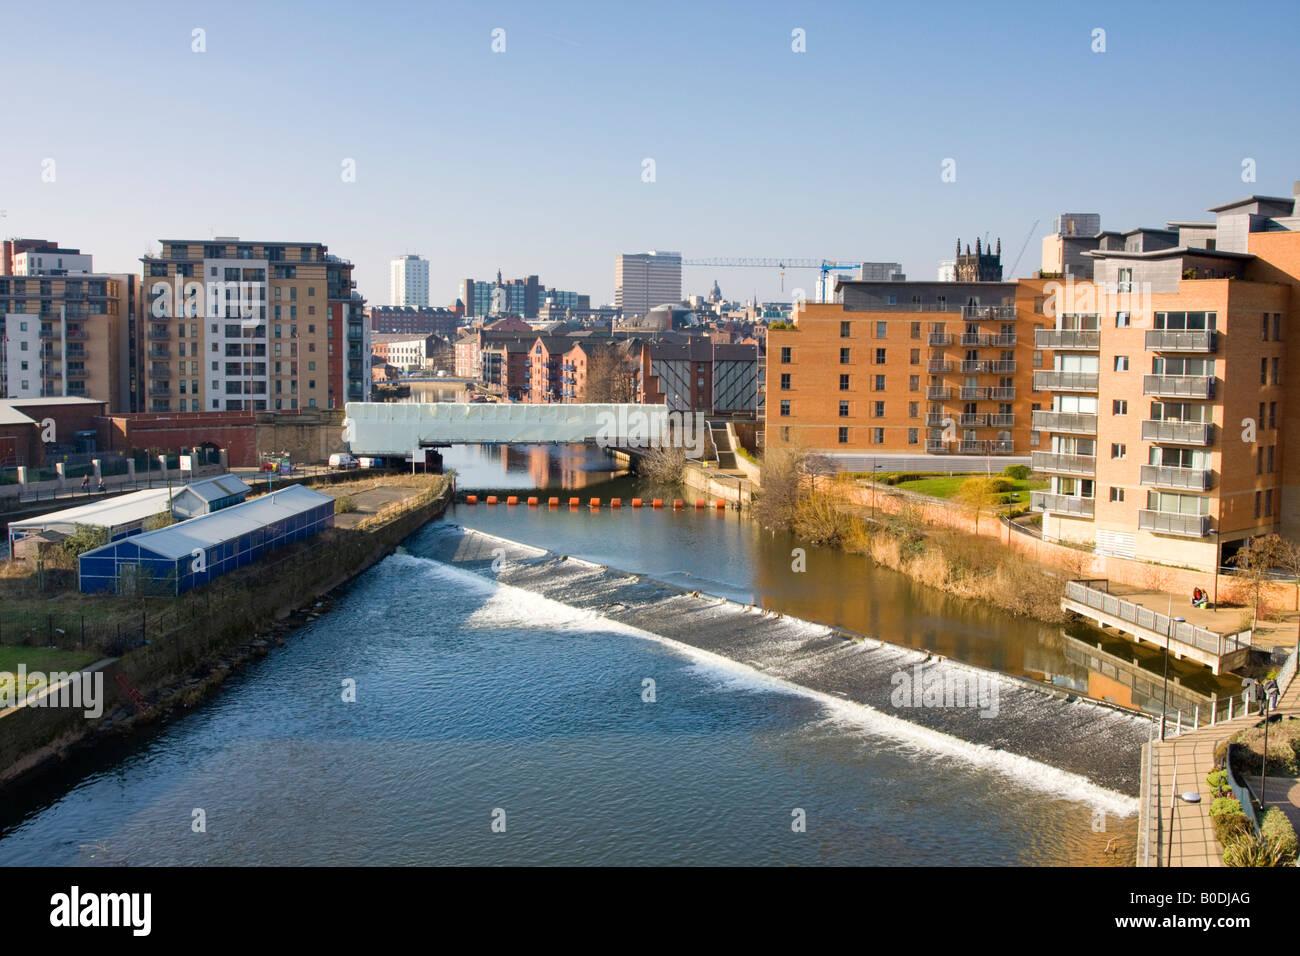 Merchants Quay and River Leeds Yorkshire UK - Stock Image